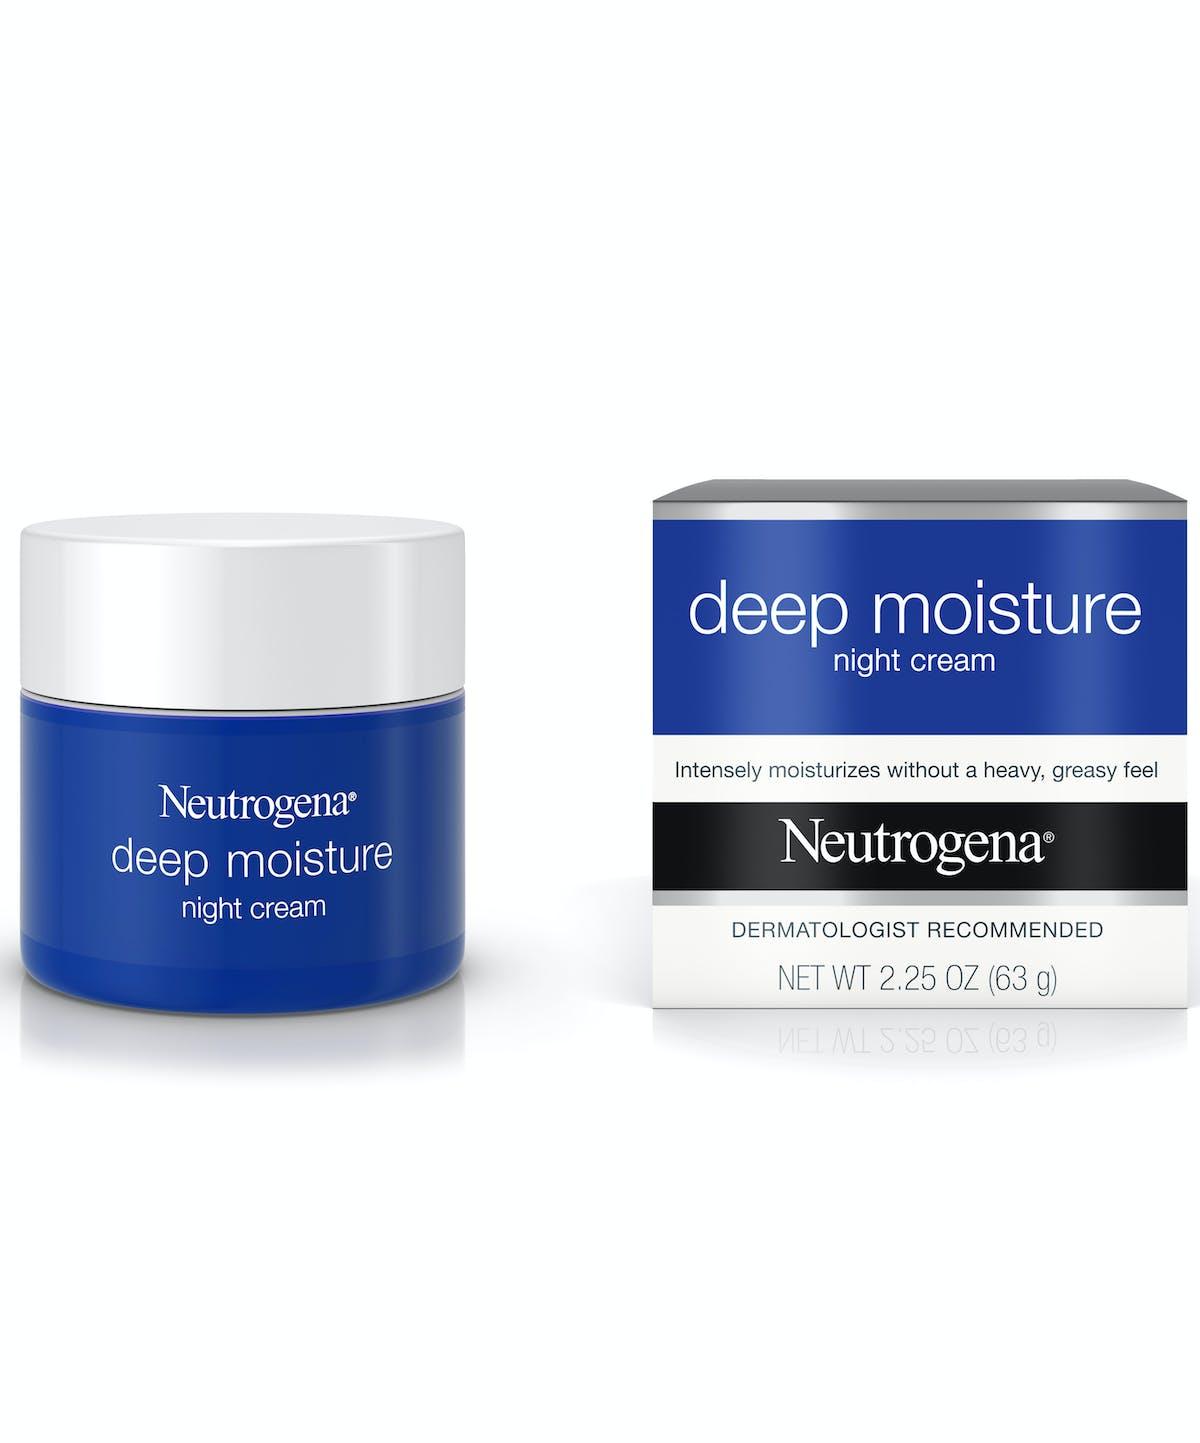 f3c79a99b4e4 Deep Moisture Night Cream for Face